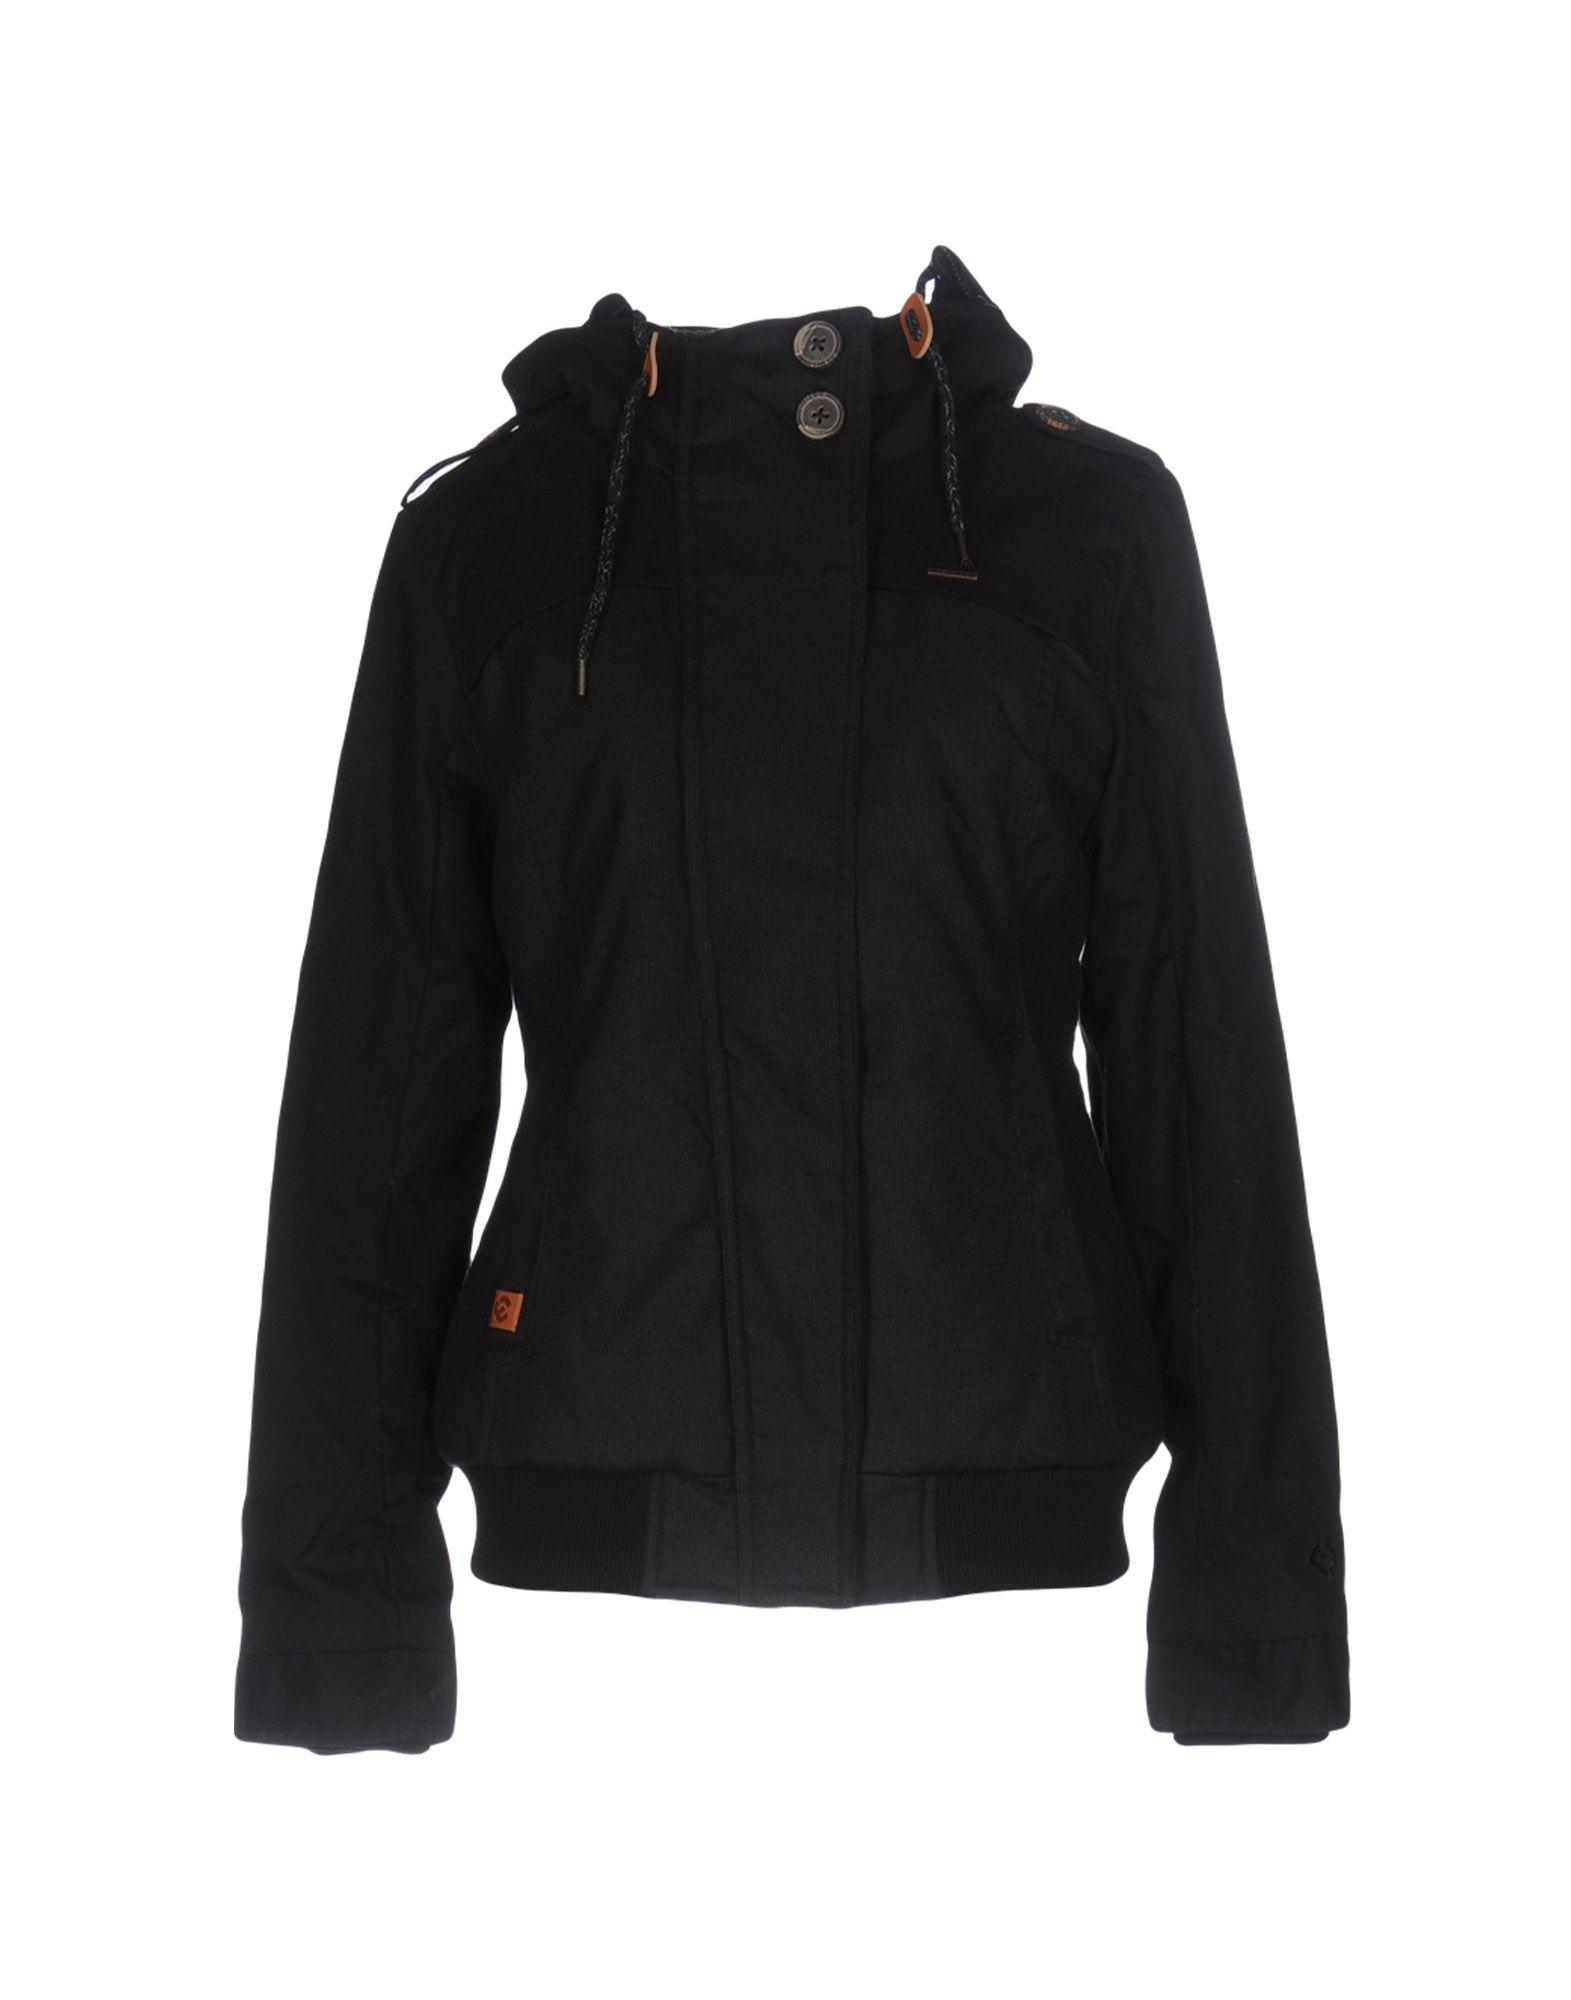 RAGWEAR Damen Jacke Farbe Schwarz Größe 3